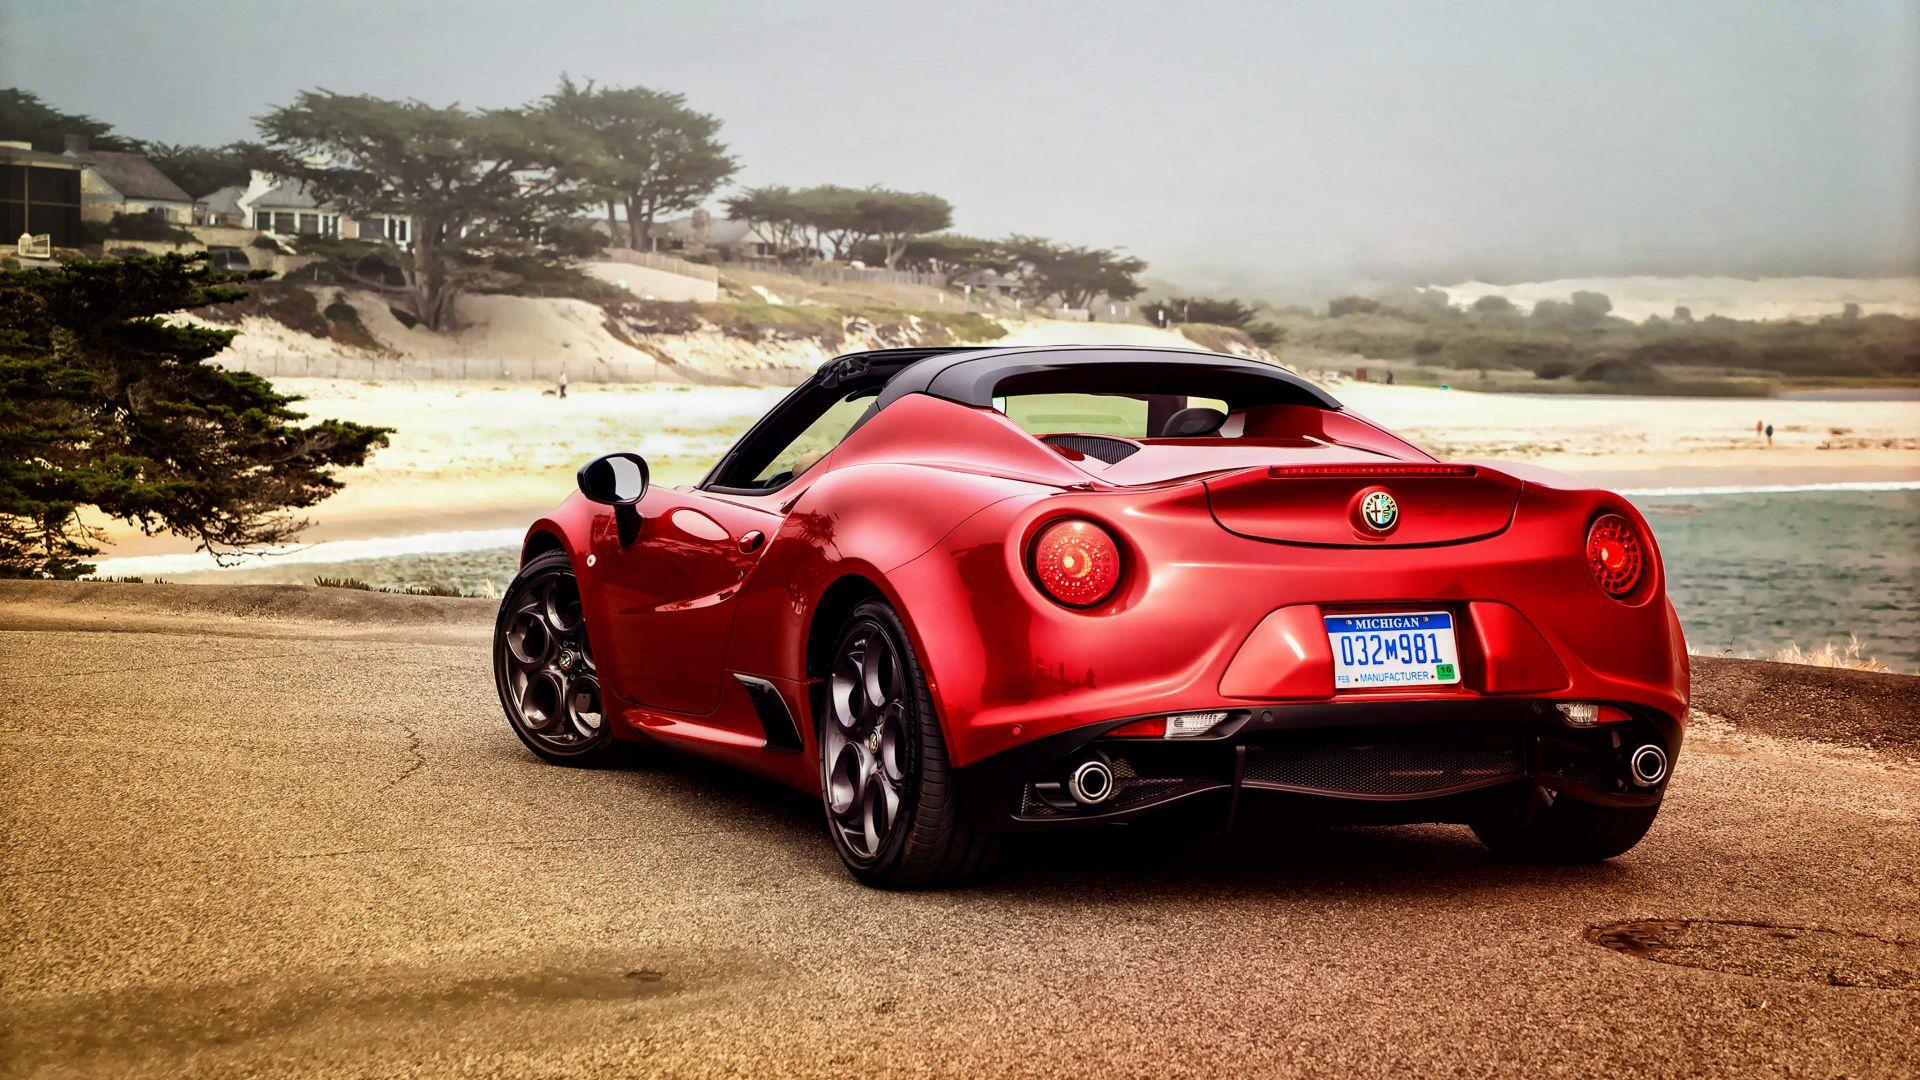 Wallpaper Alfa Romeo 4C Spider, Red car